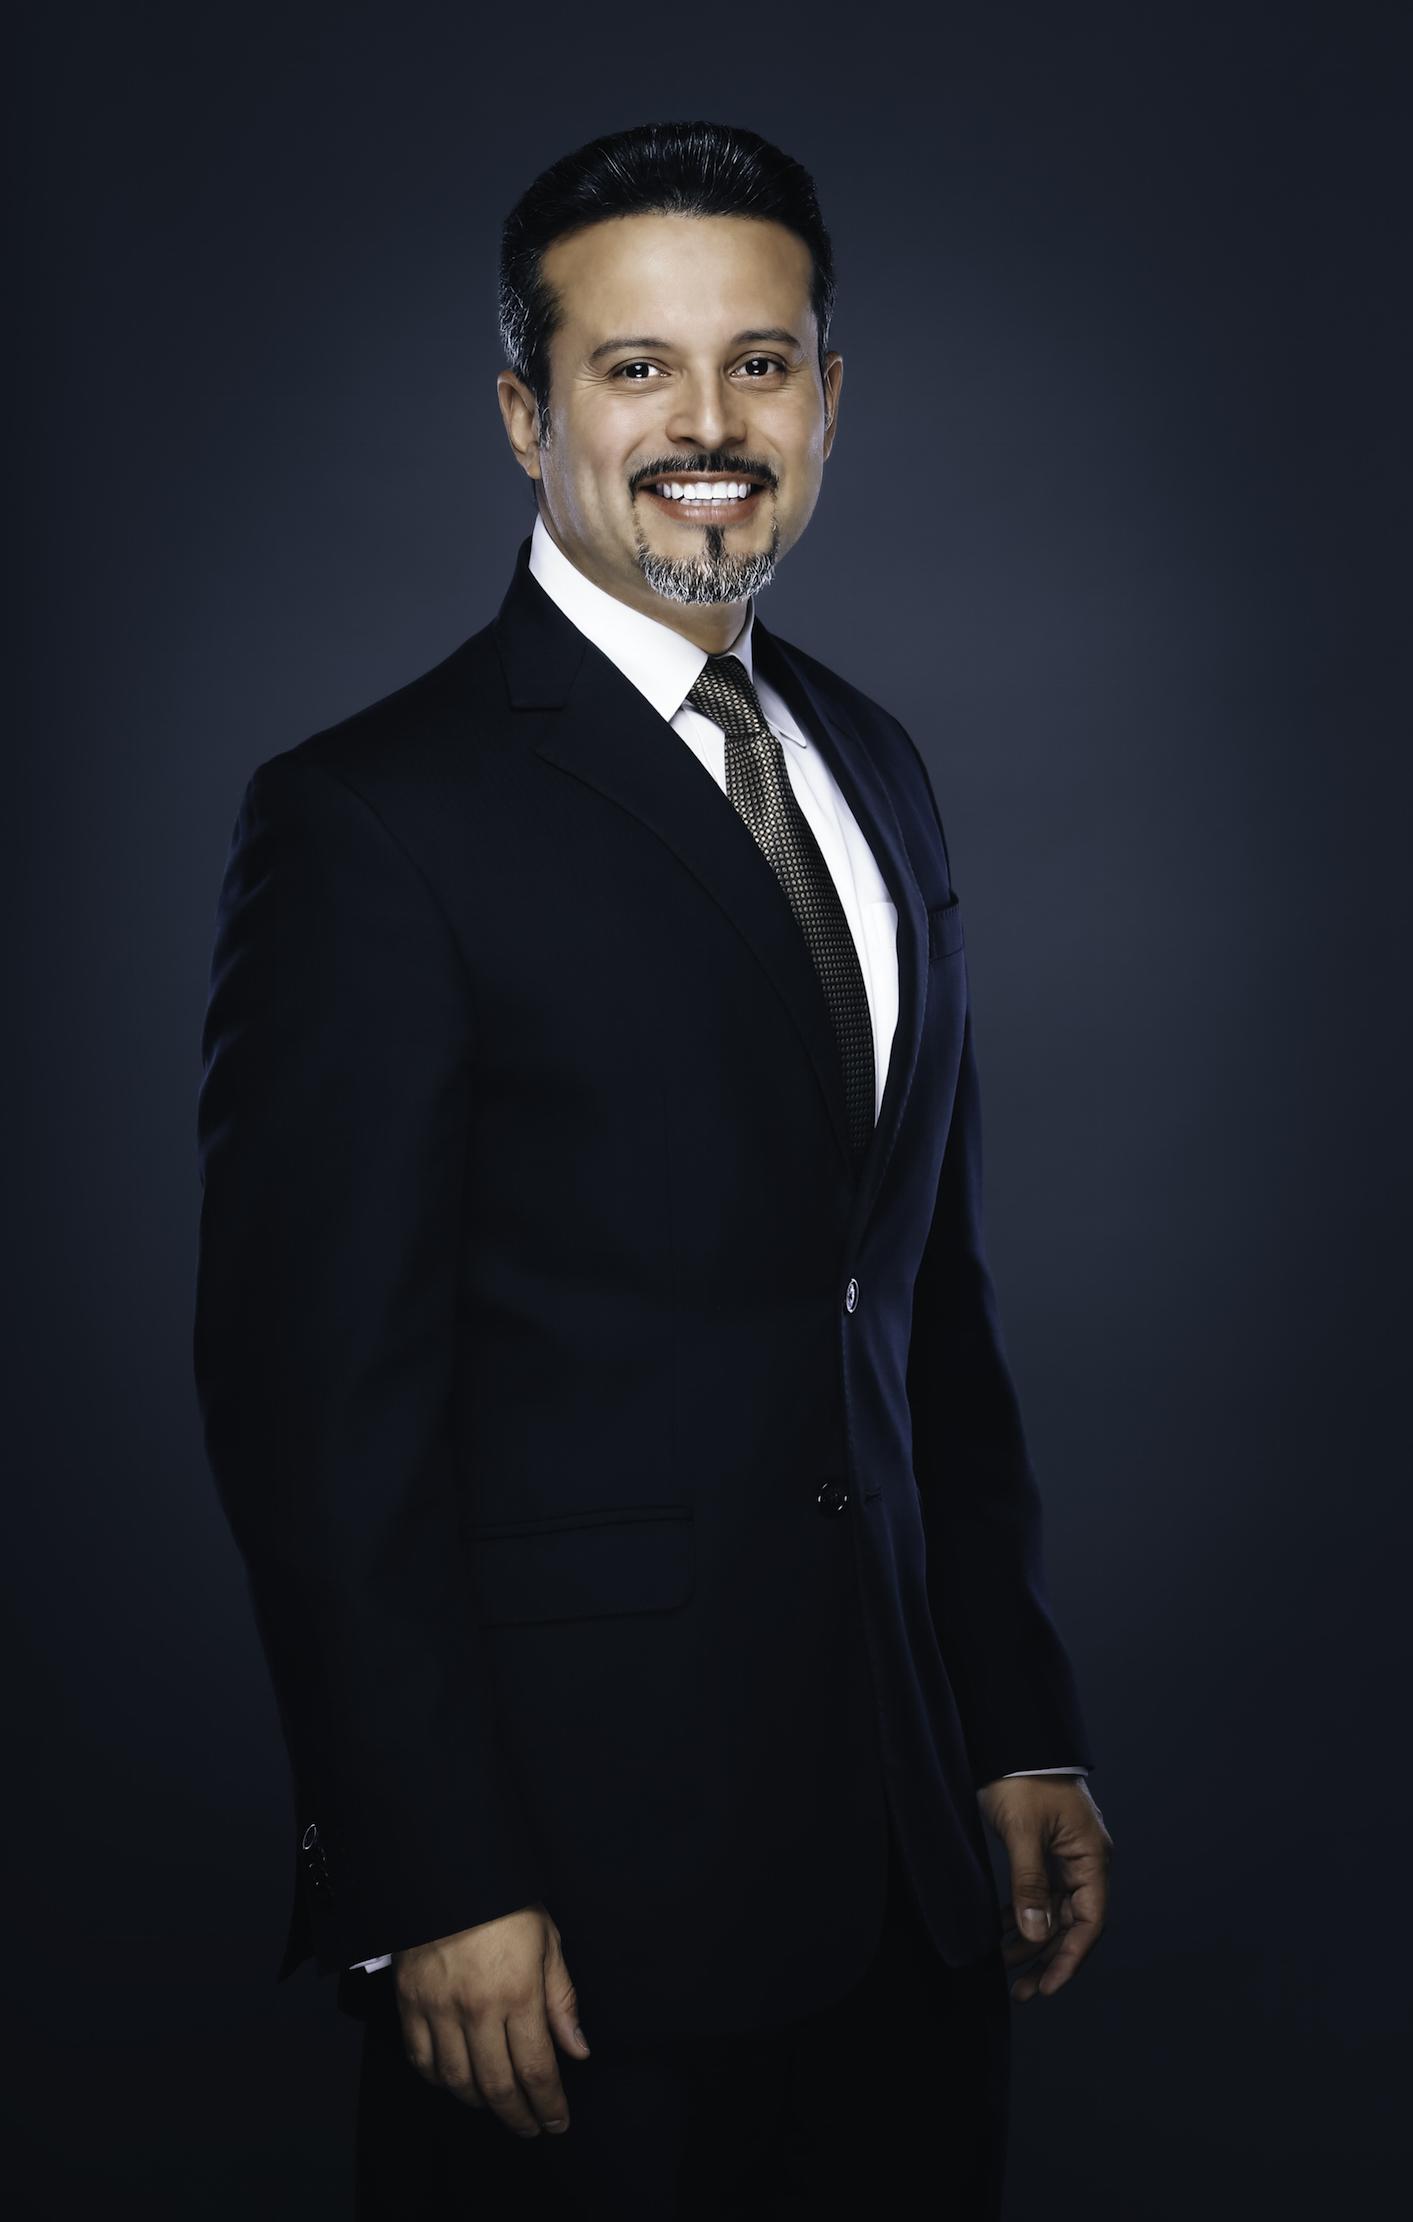 Elden Ramirez